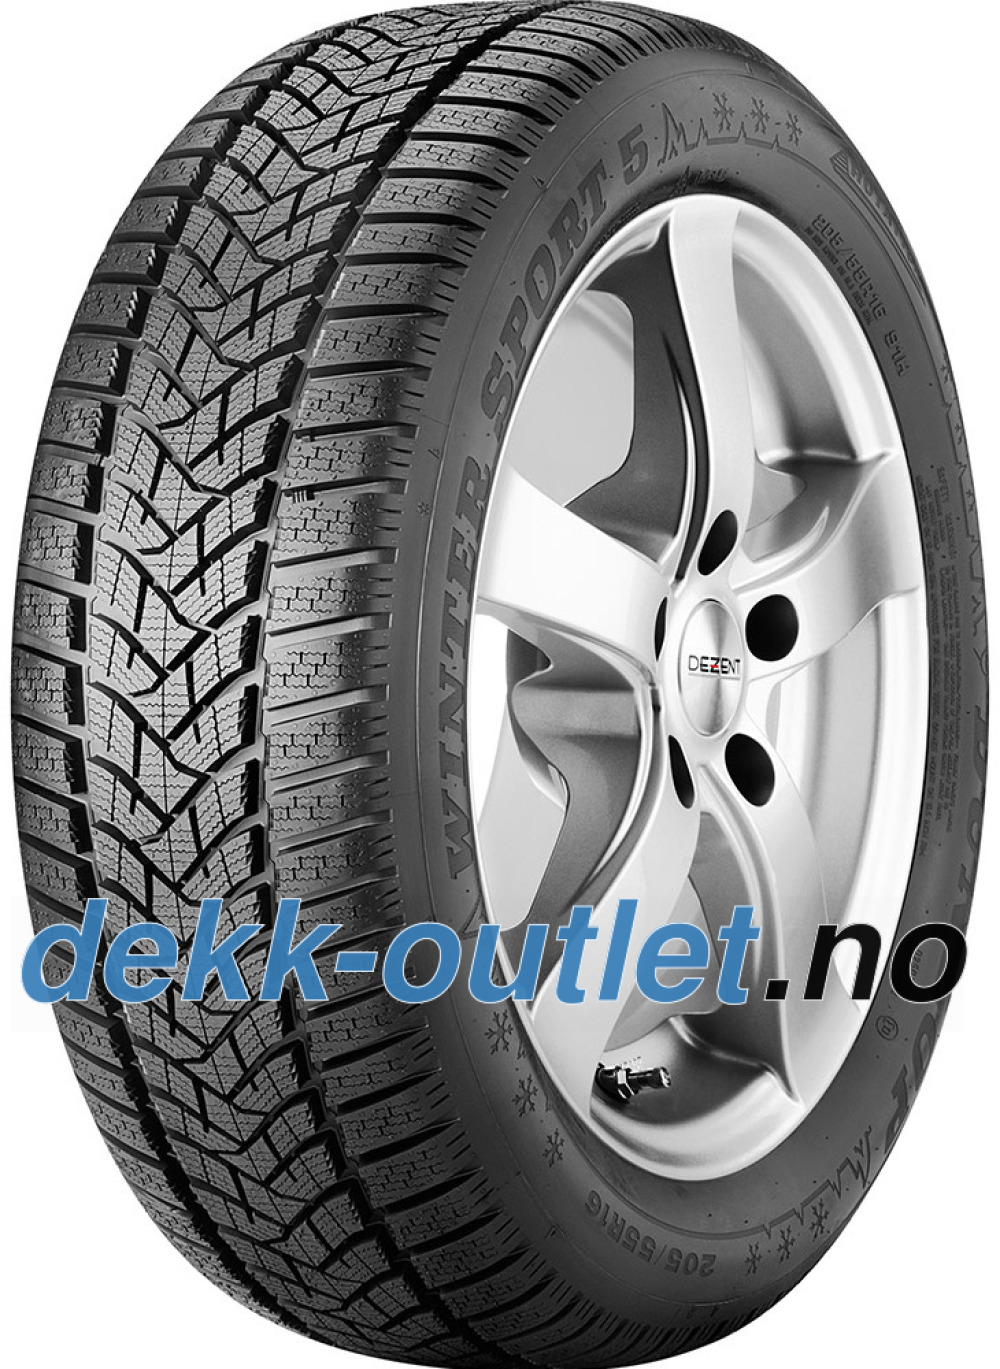 Dunlop Winter Sport 5 ( 215/70 R16 100T SUV )